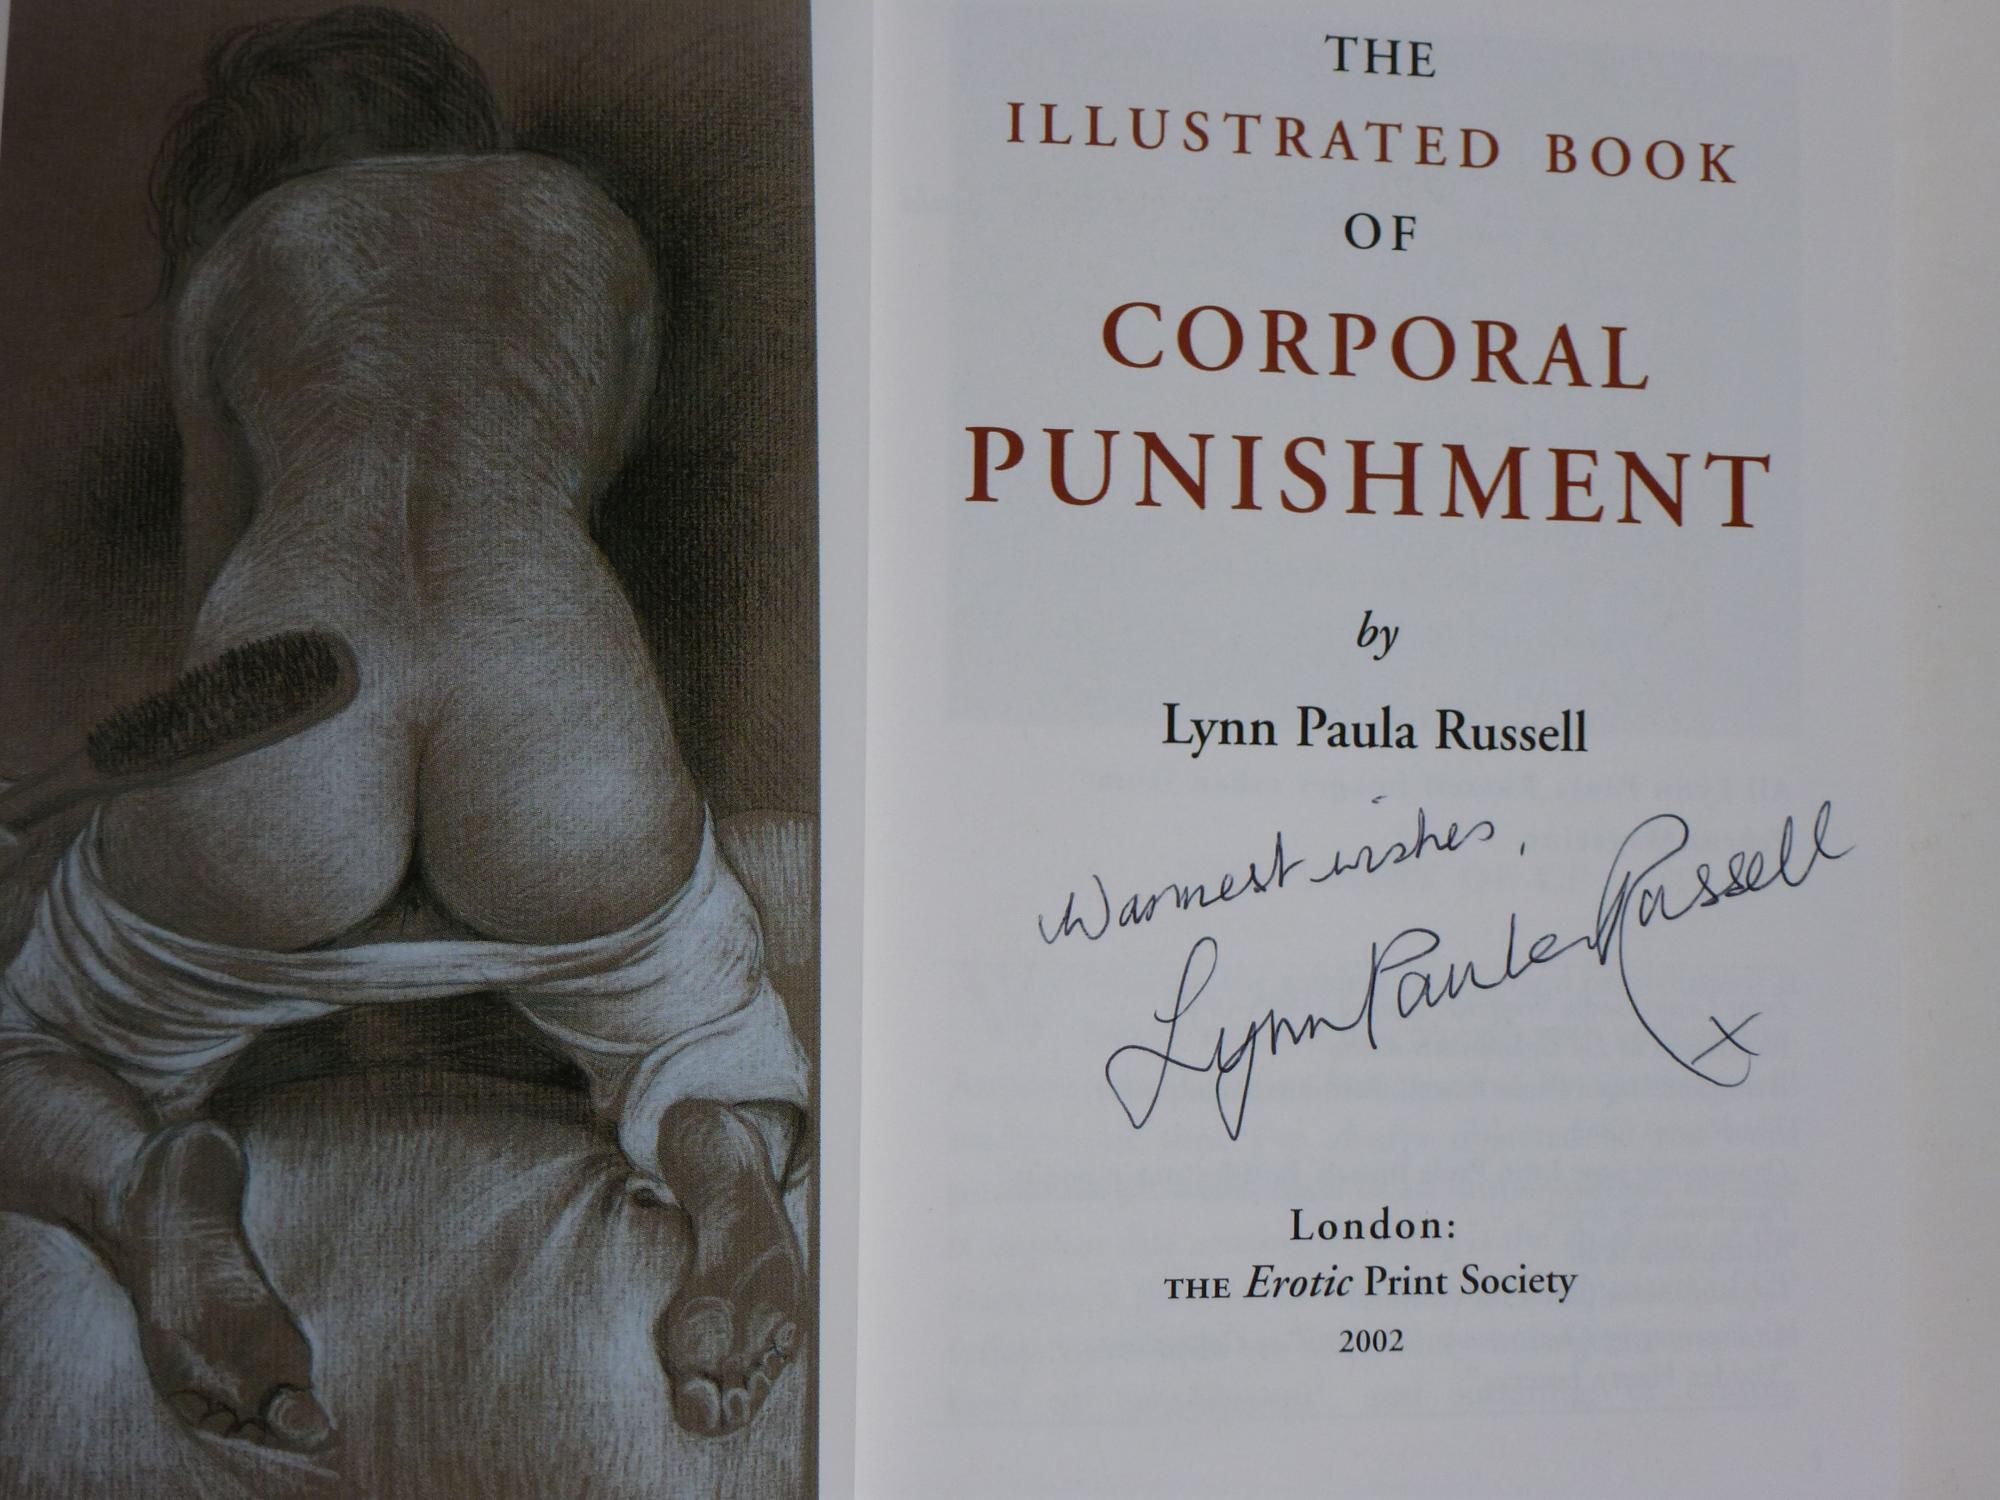 Erotic book print society